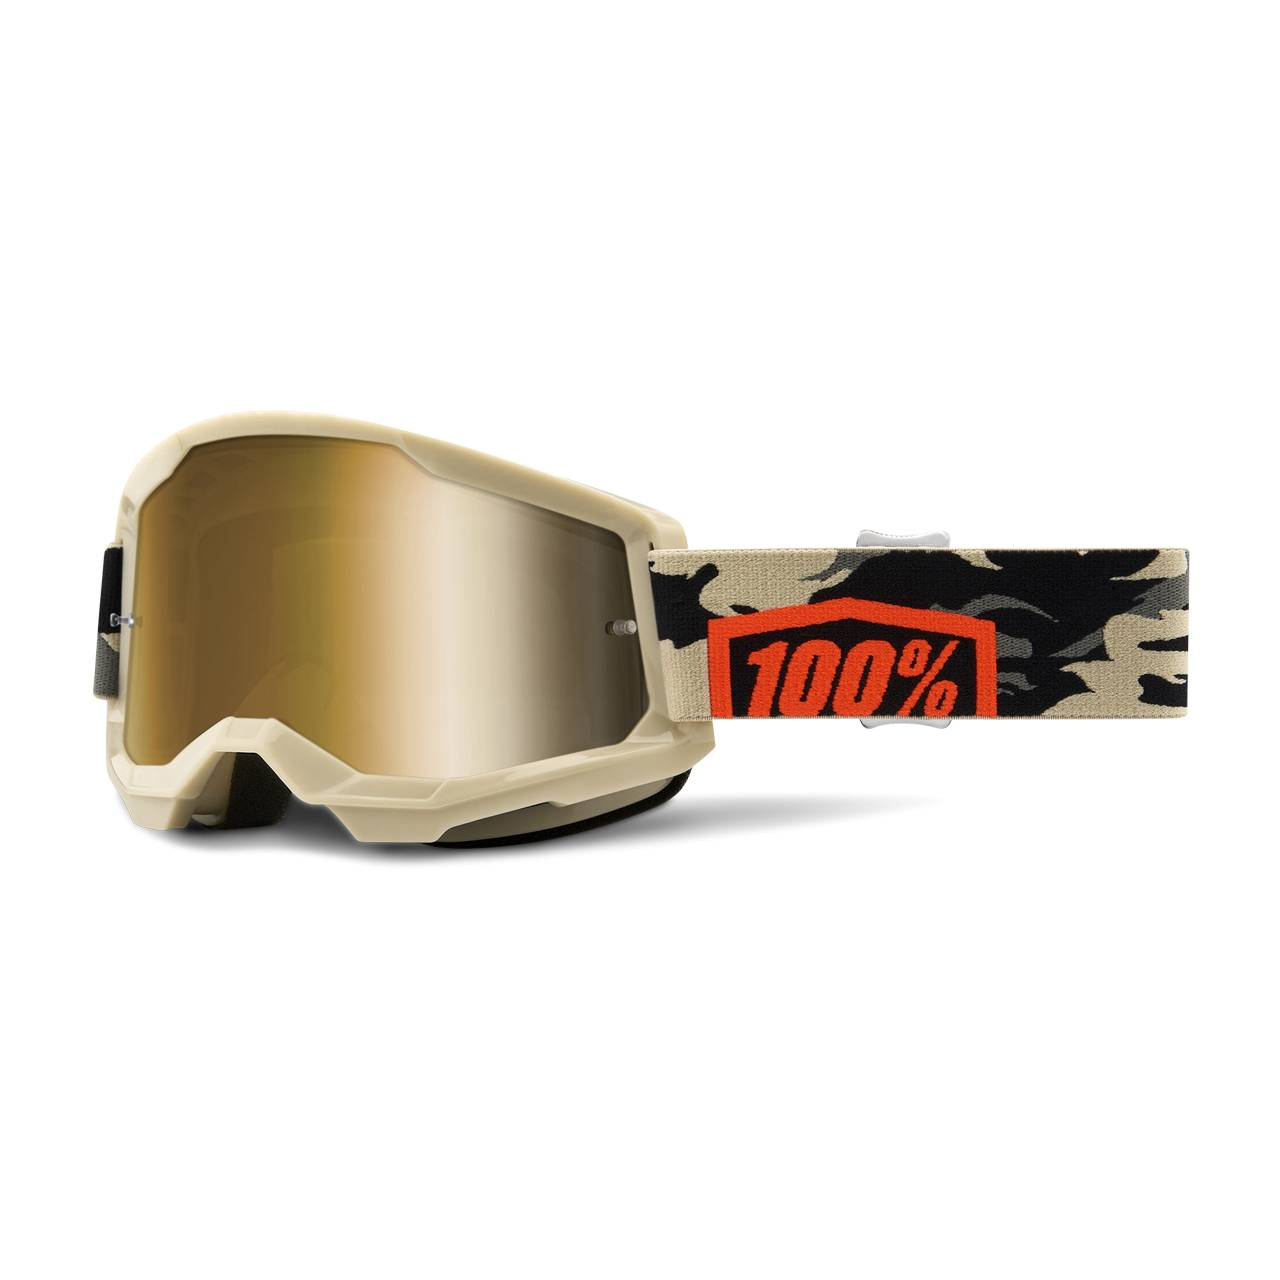 100% Masque Cross 100% Strata 2 Kombat Camouflage